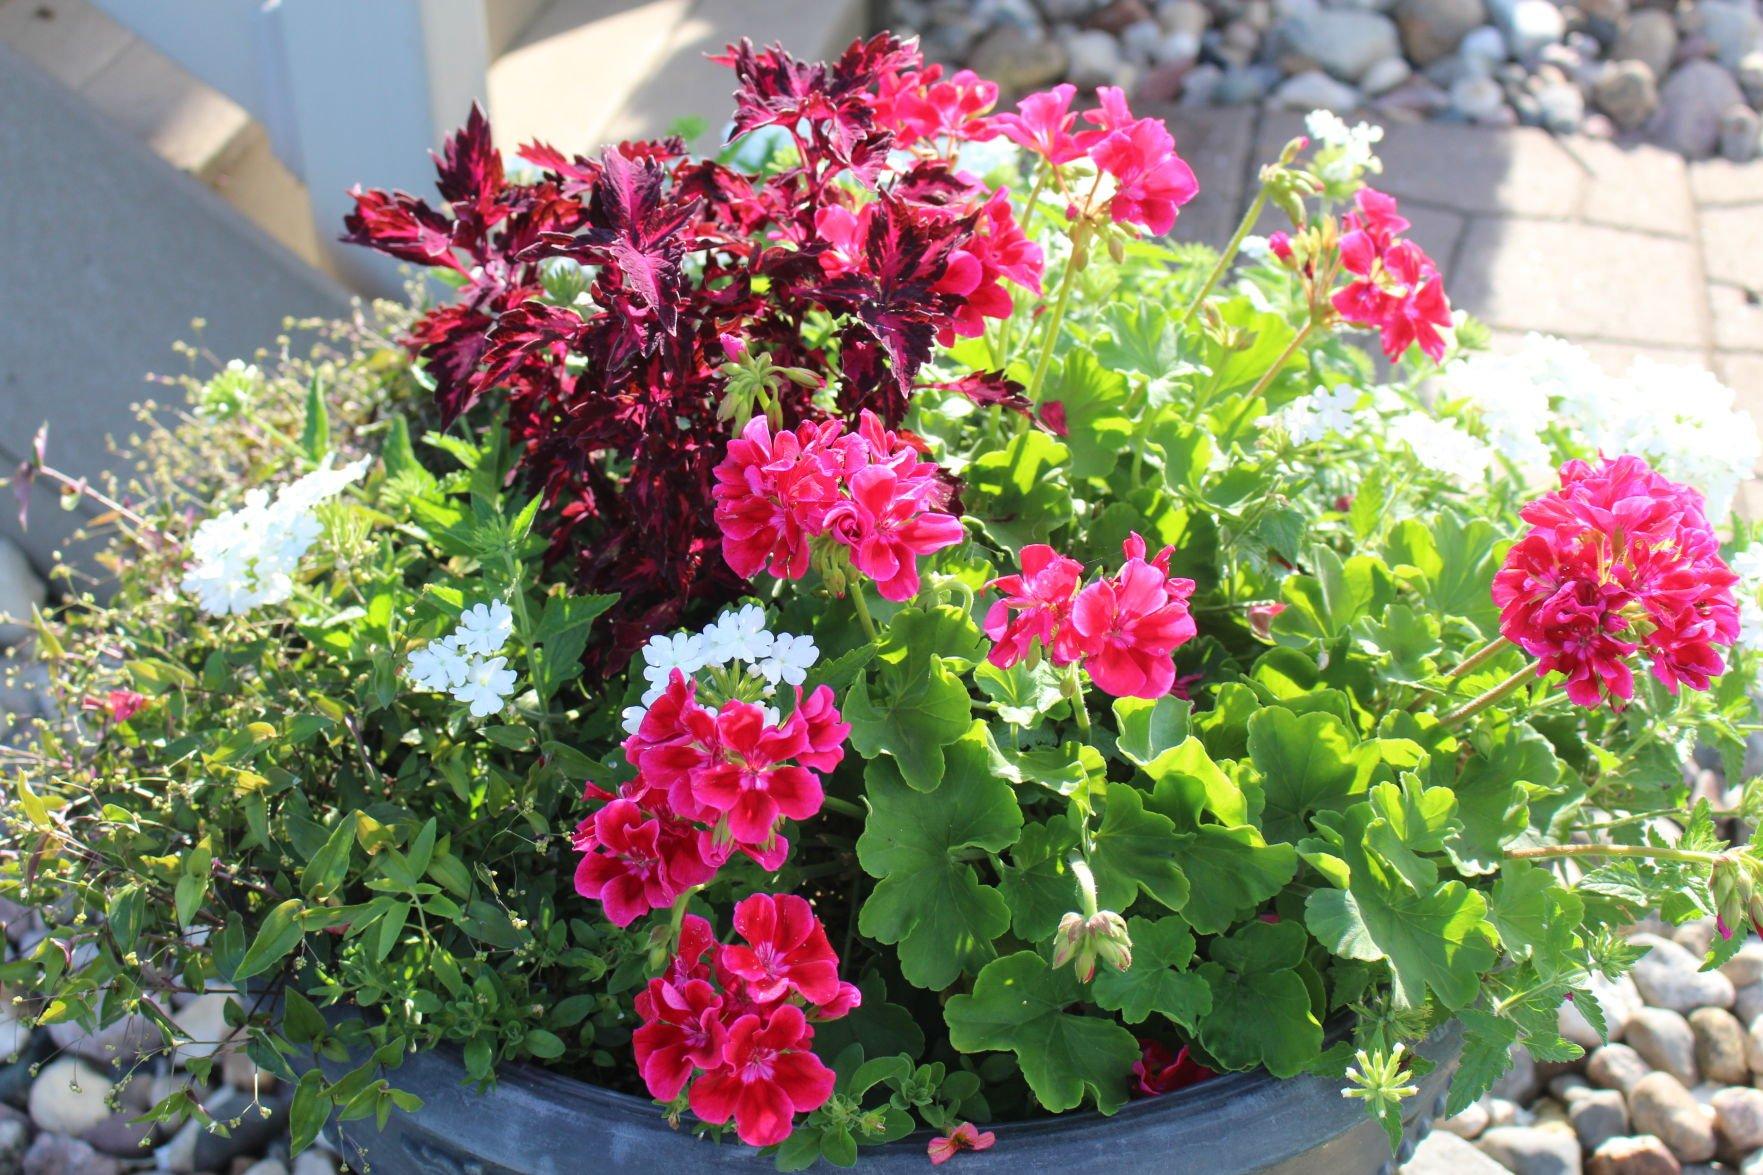 Flower gardens were beautiful